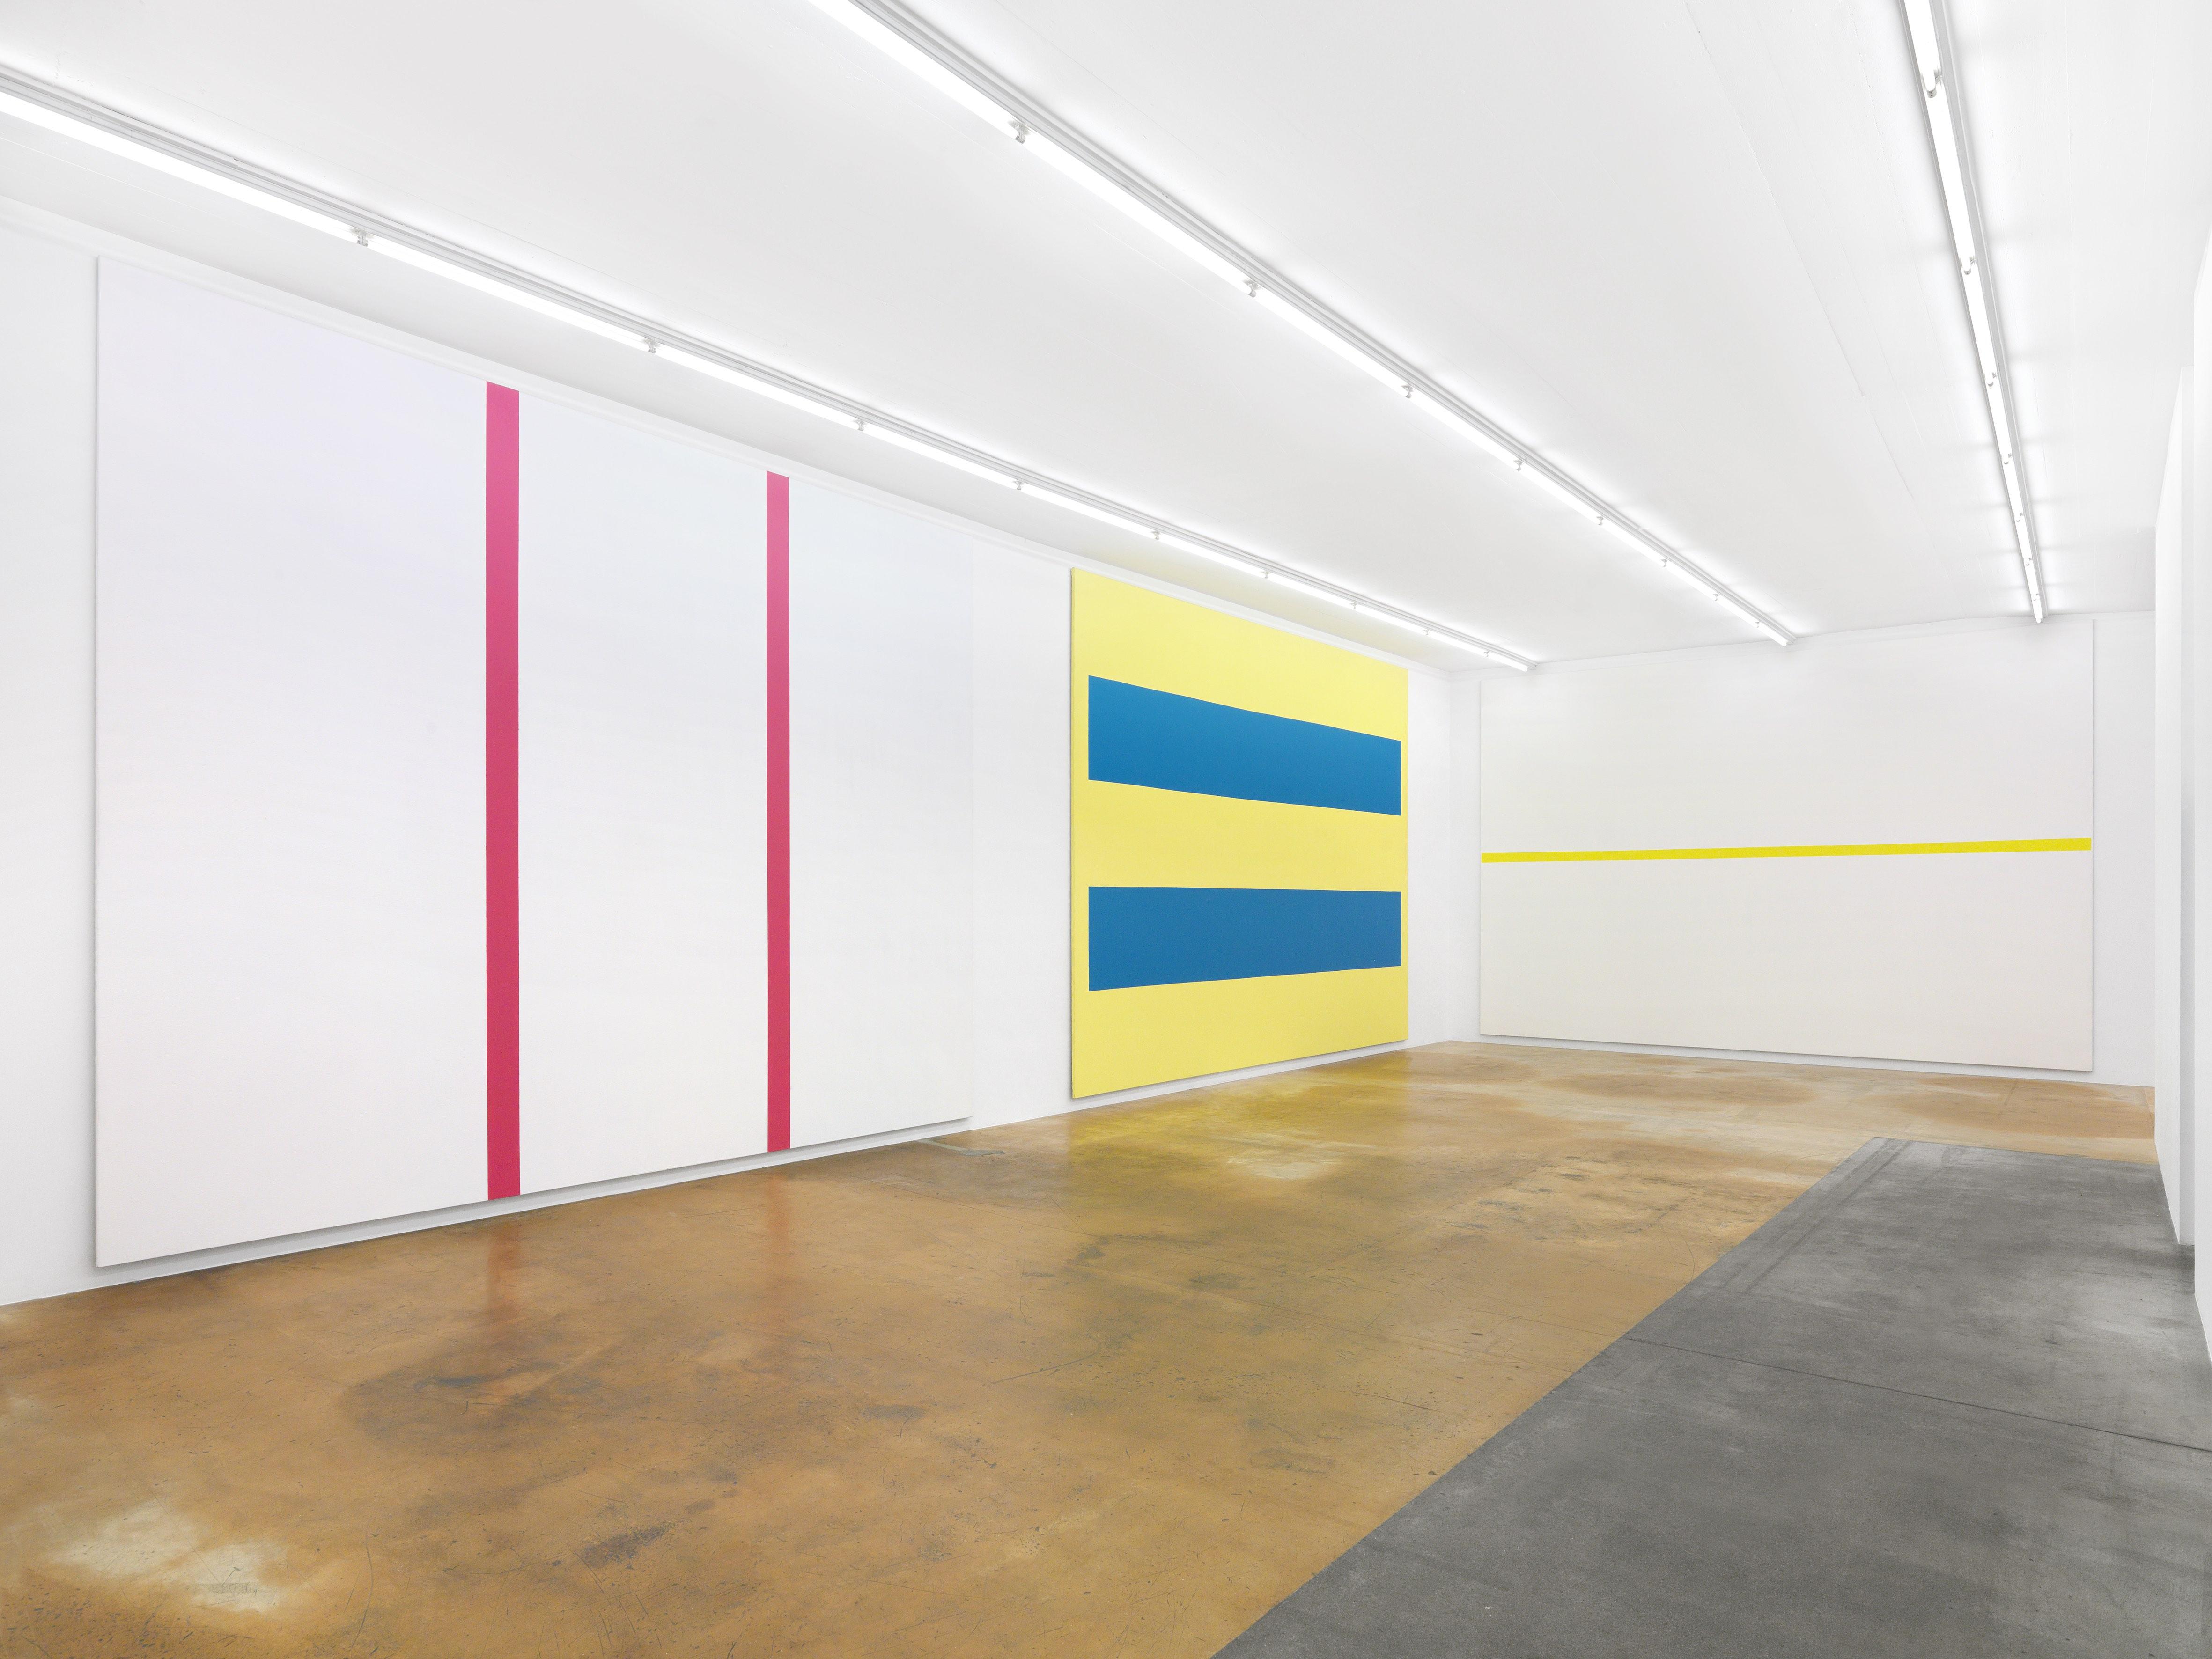 Installation view: Olivier Mosset at MAMCO Geneva / Photo credits: Annik Wetter–MAMCO Geneva